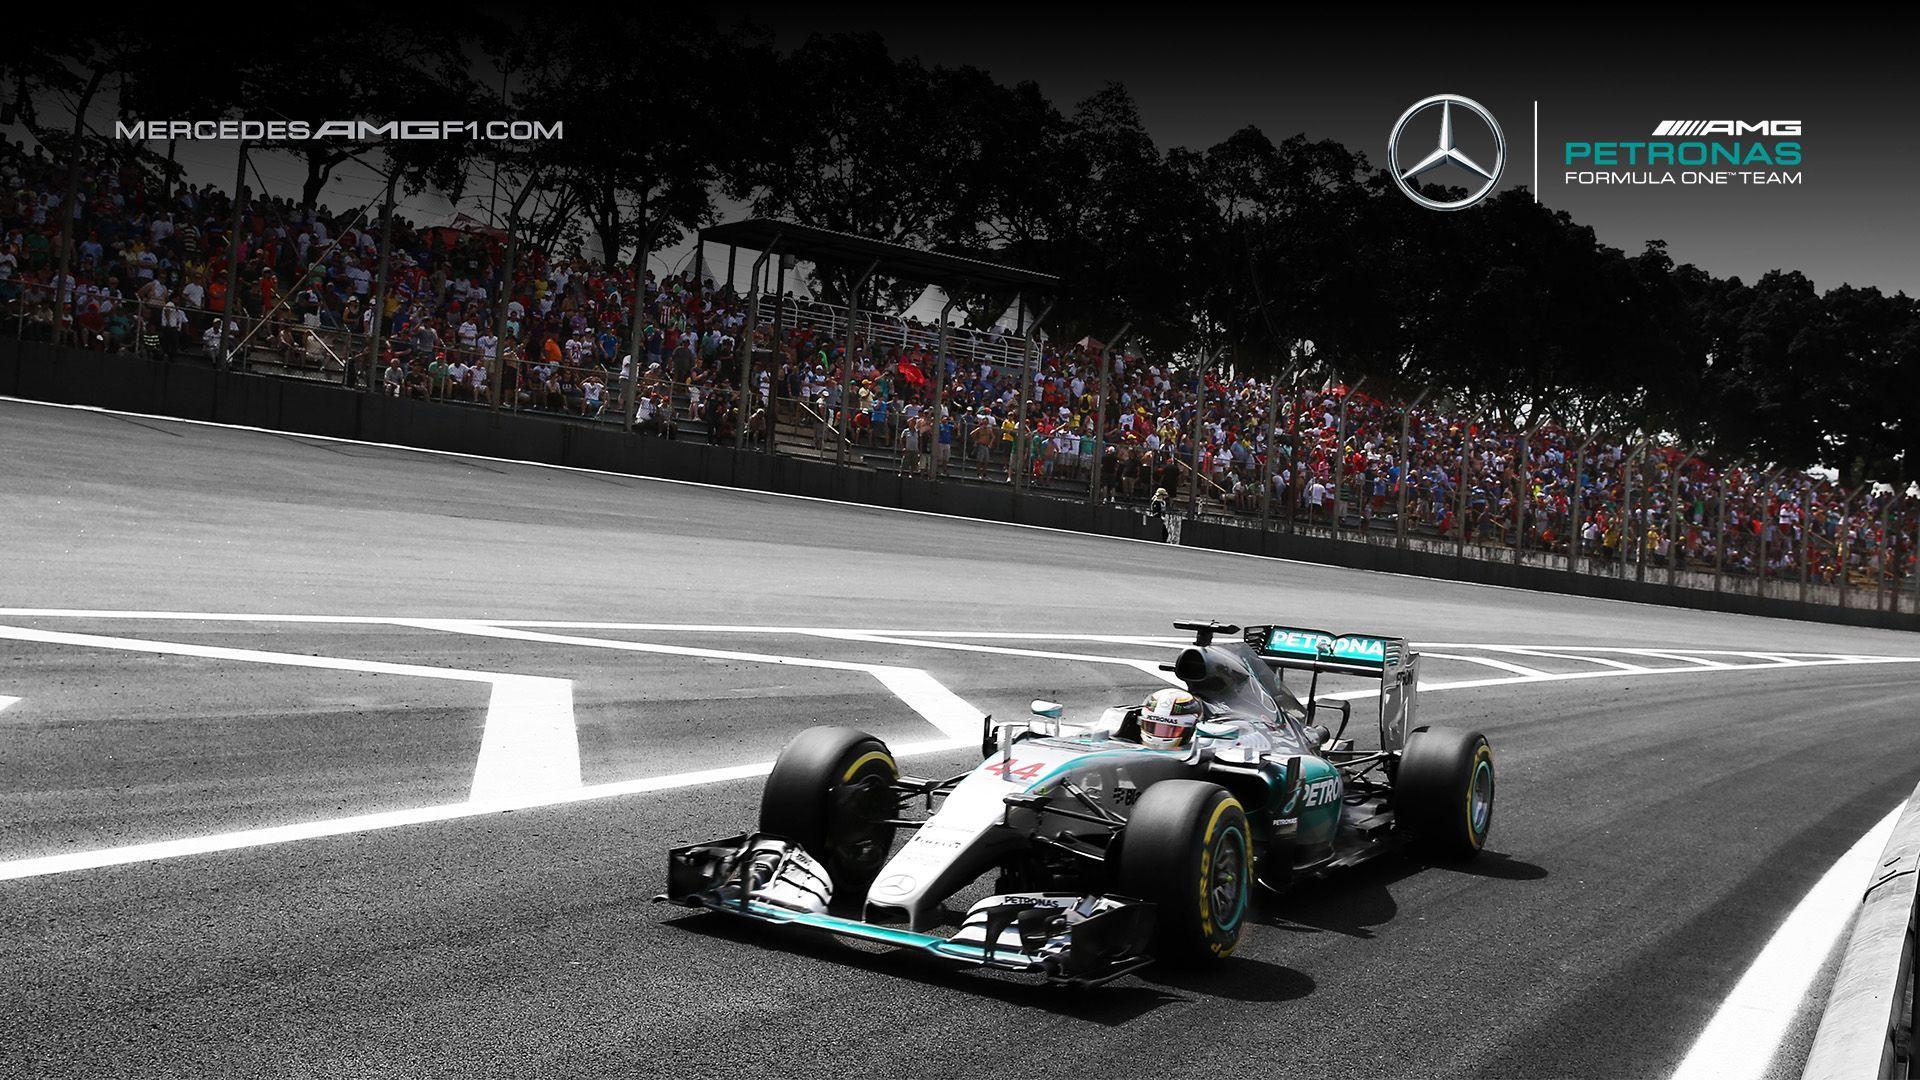 Mercedes f1 w08 wallpaper 10